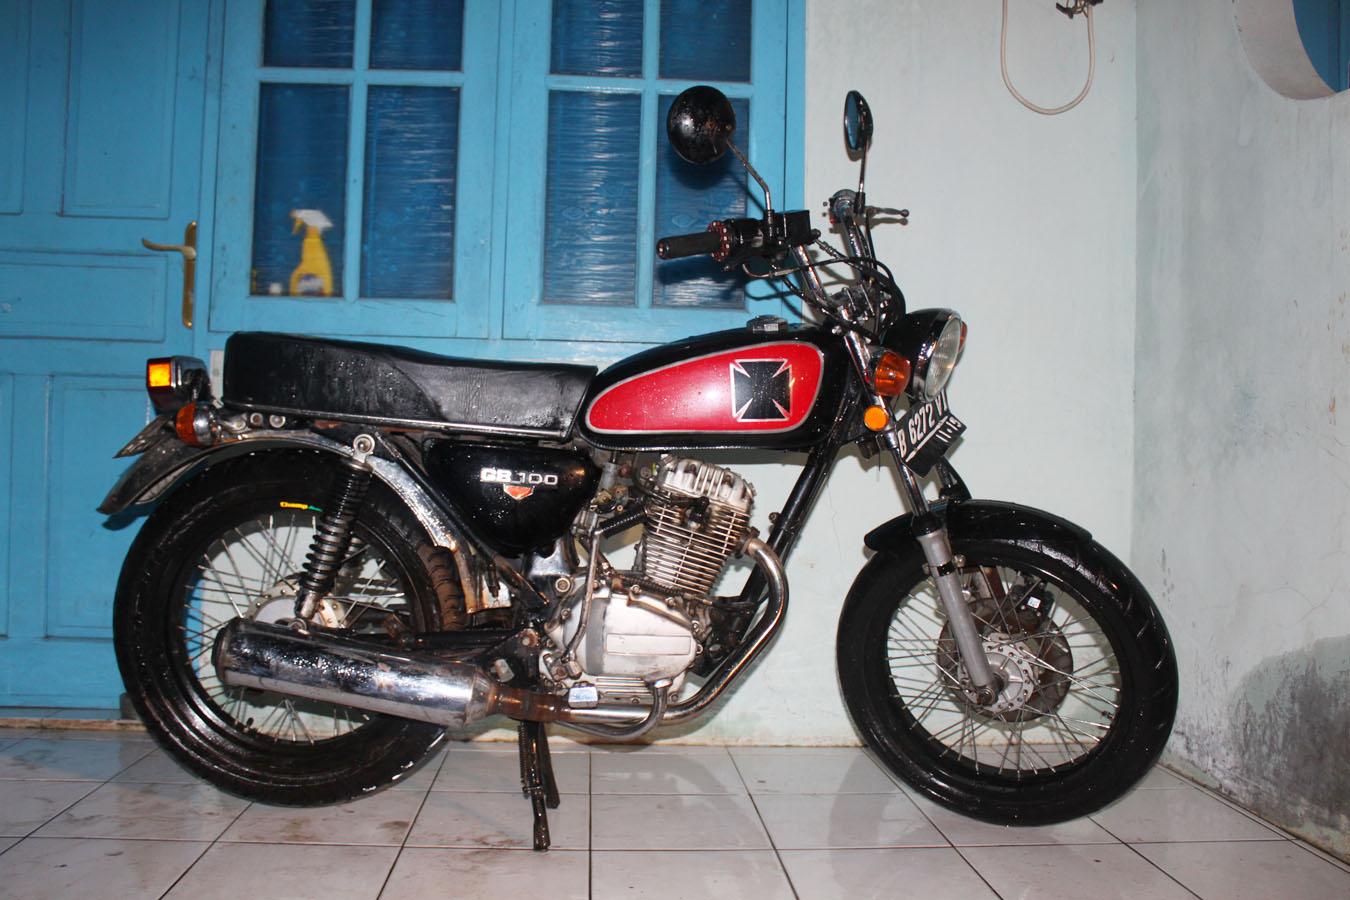 101 Bengkel Modifikasi Motor Cb 100 Jakarta Modifikasi Motor Honda